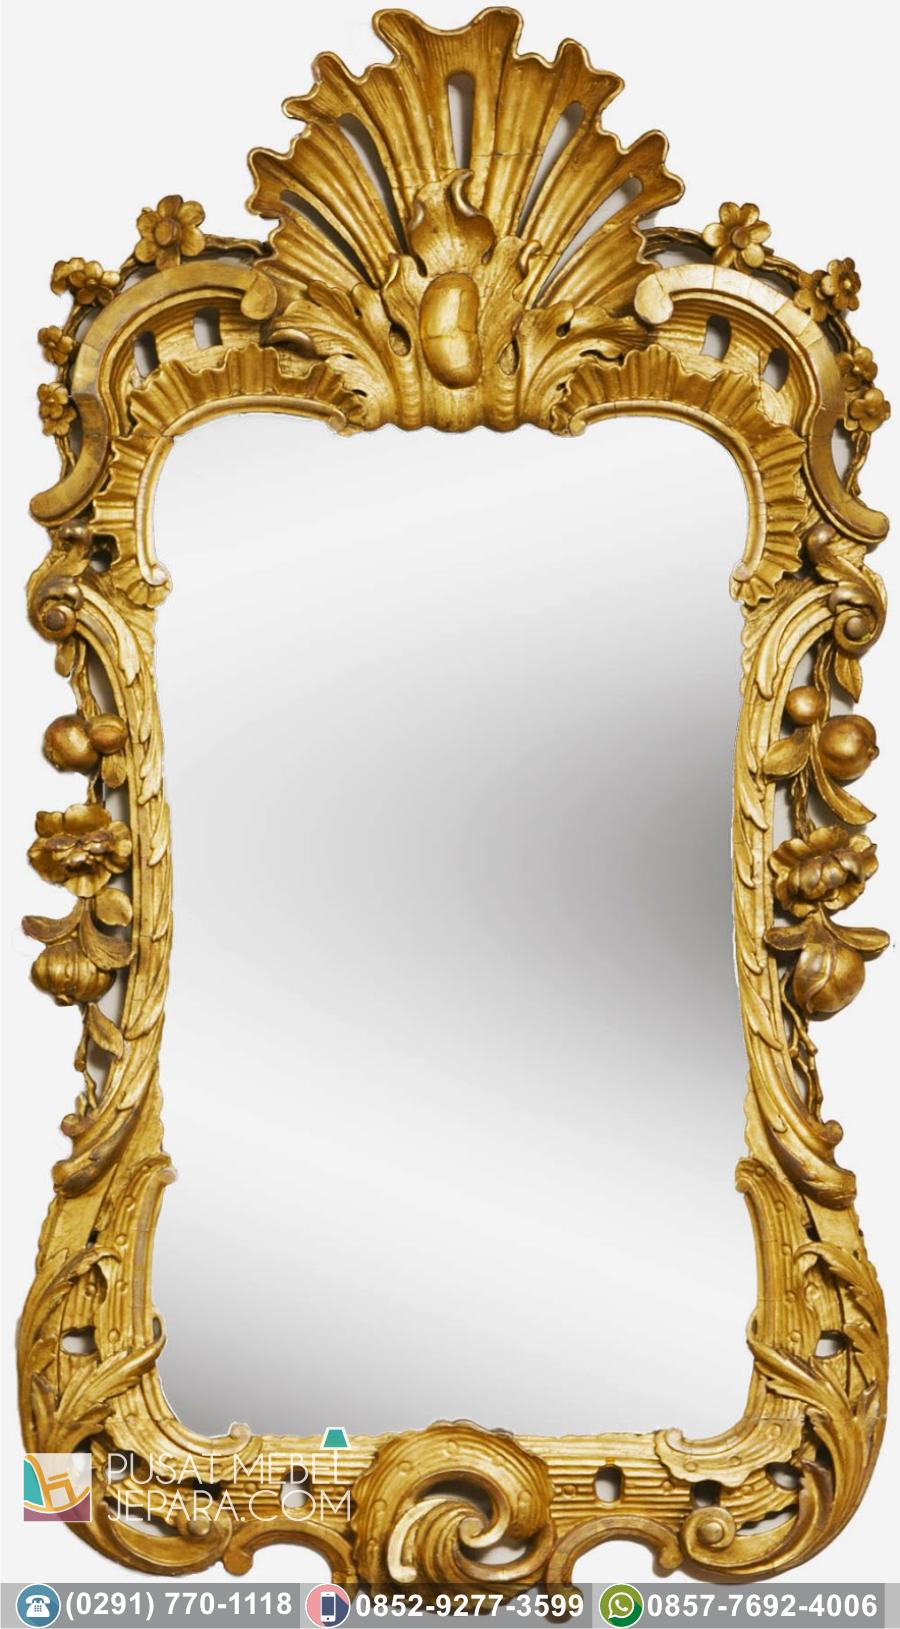 Bingkai Frame Pigura Cermin Ukir Minimalis Kediri Terbaru Duco Putih